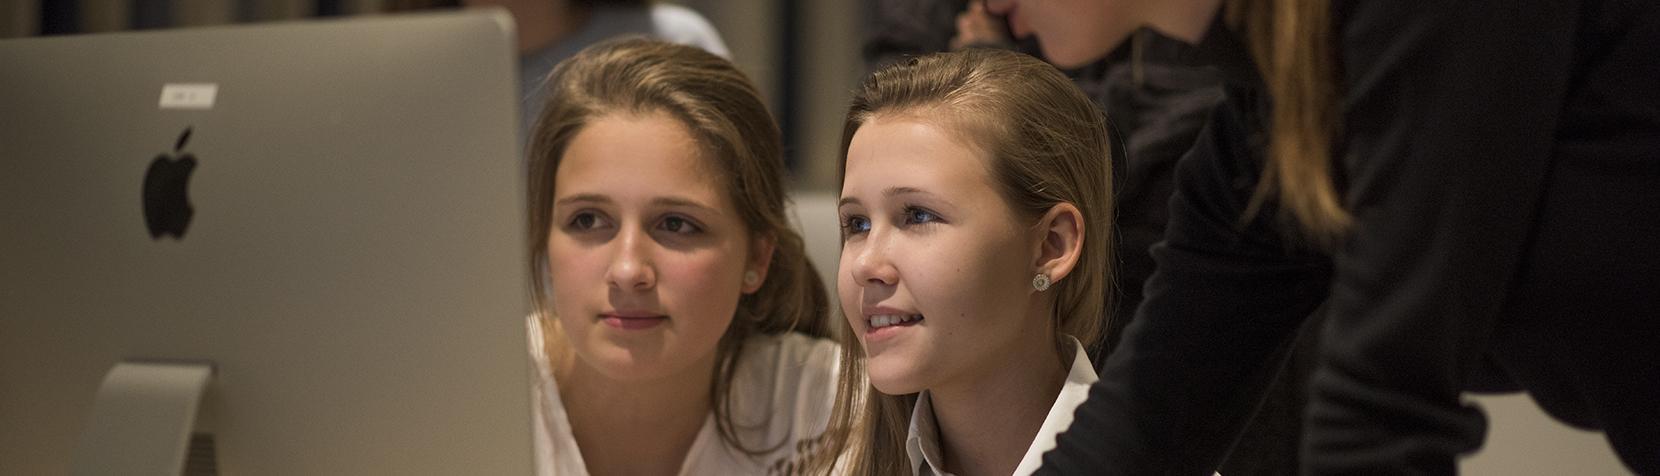 Unge undervises i at blogge